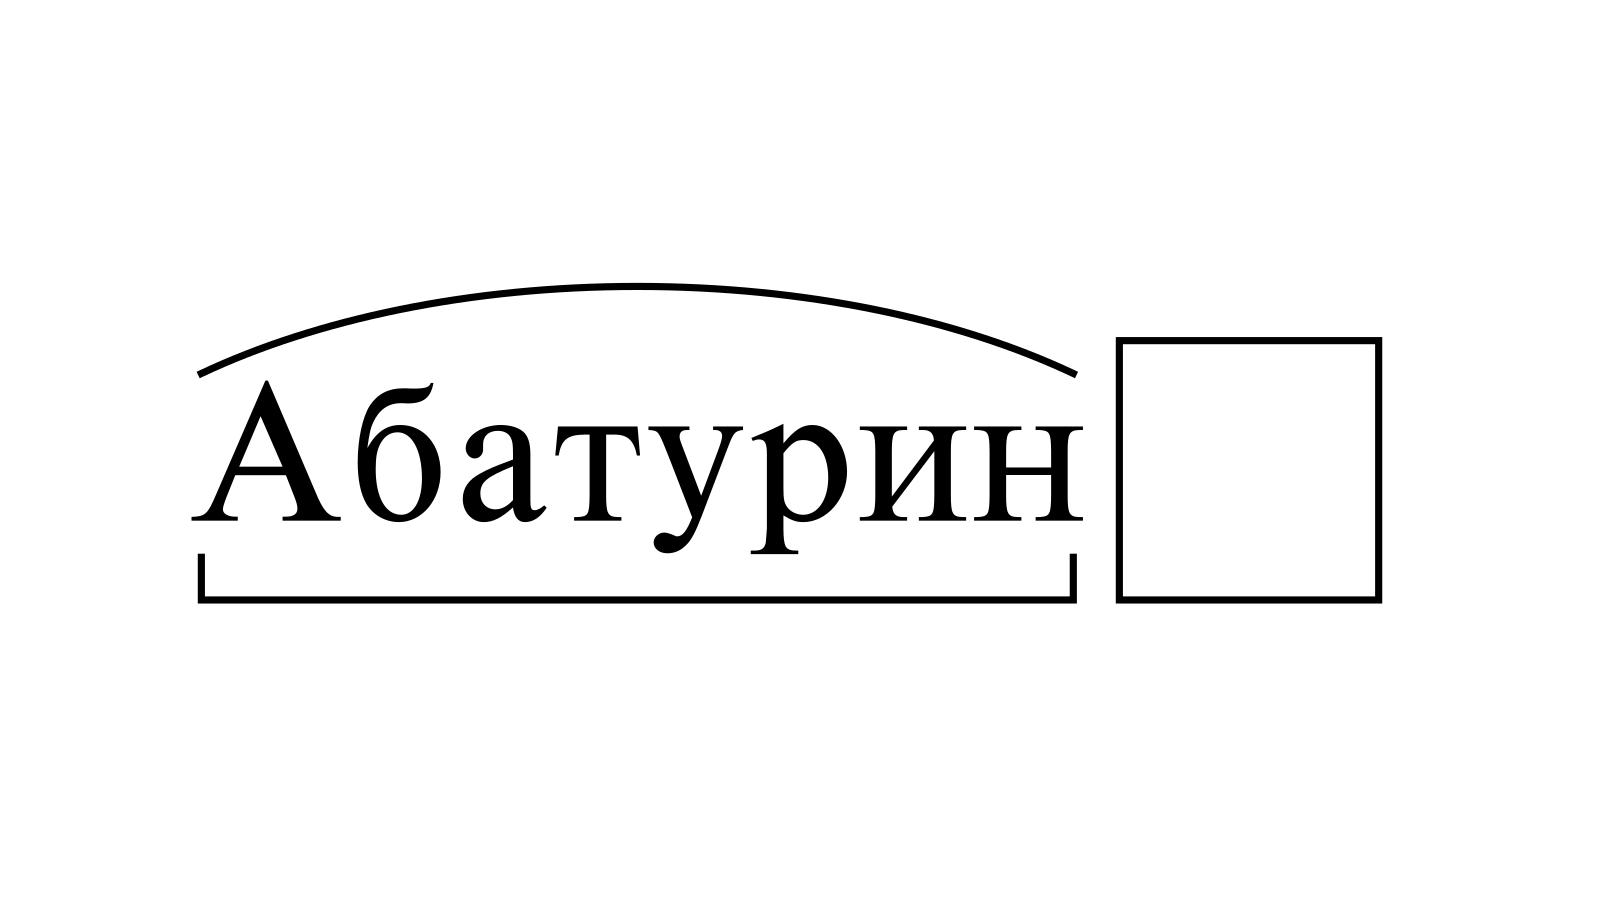 Разбор слова «Абатурин» по составу